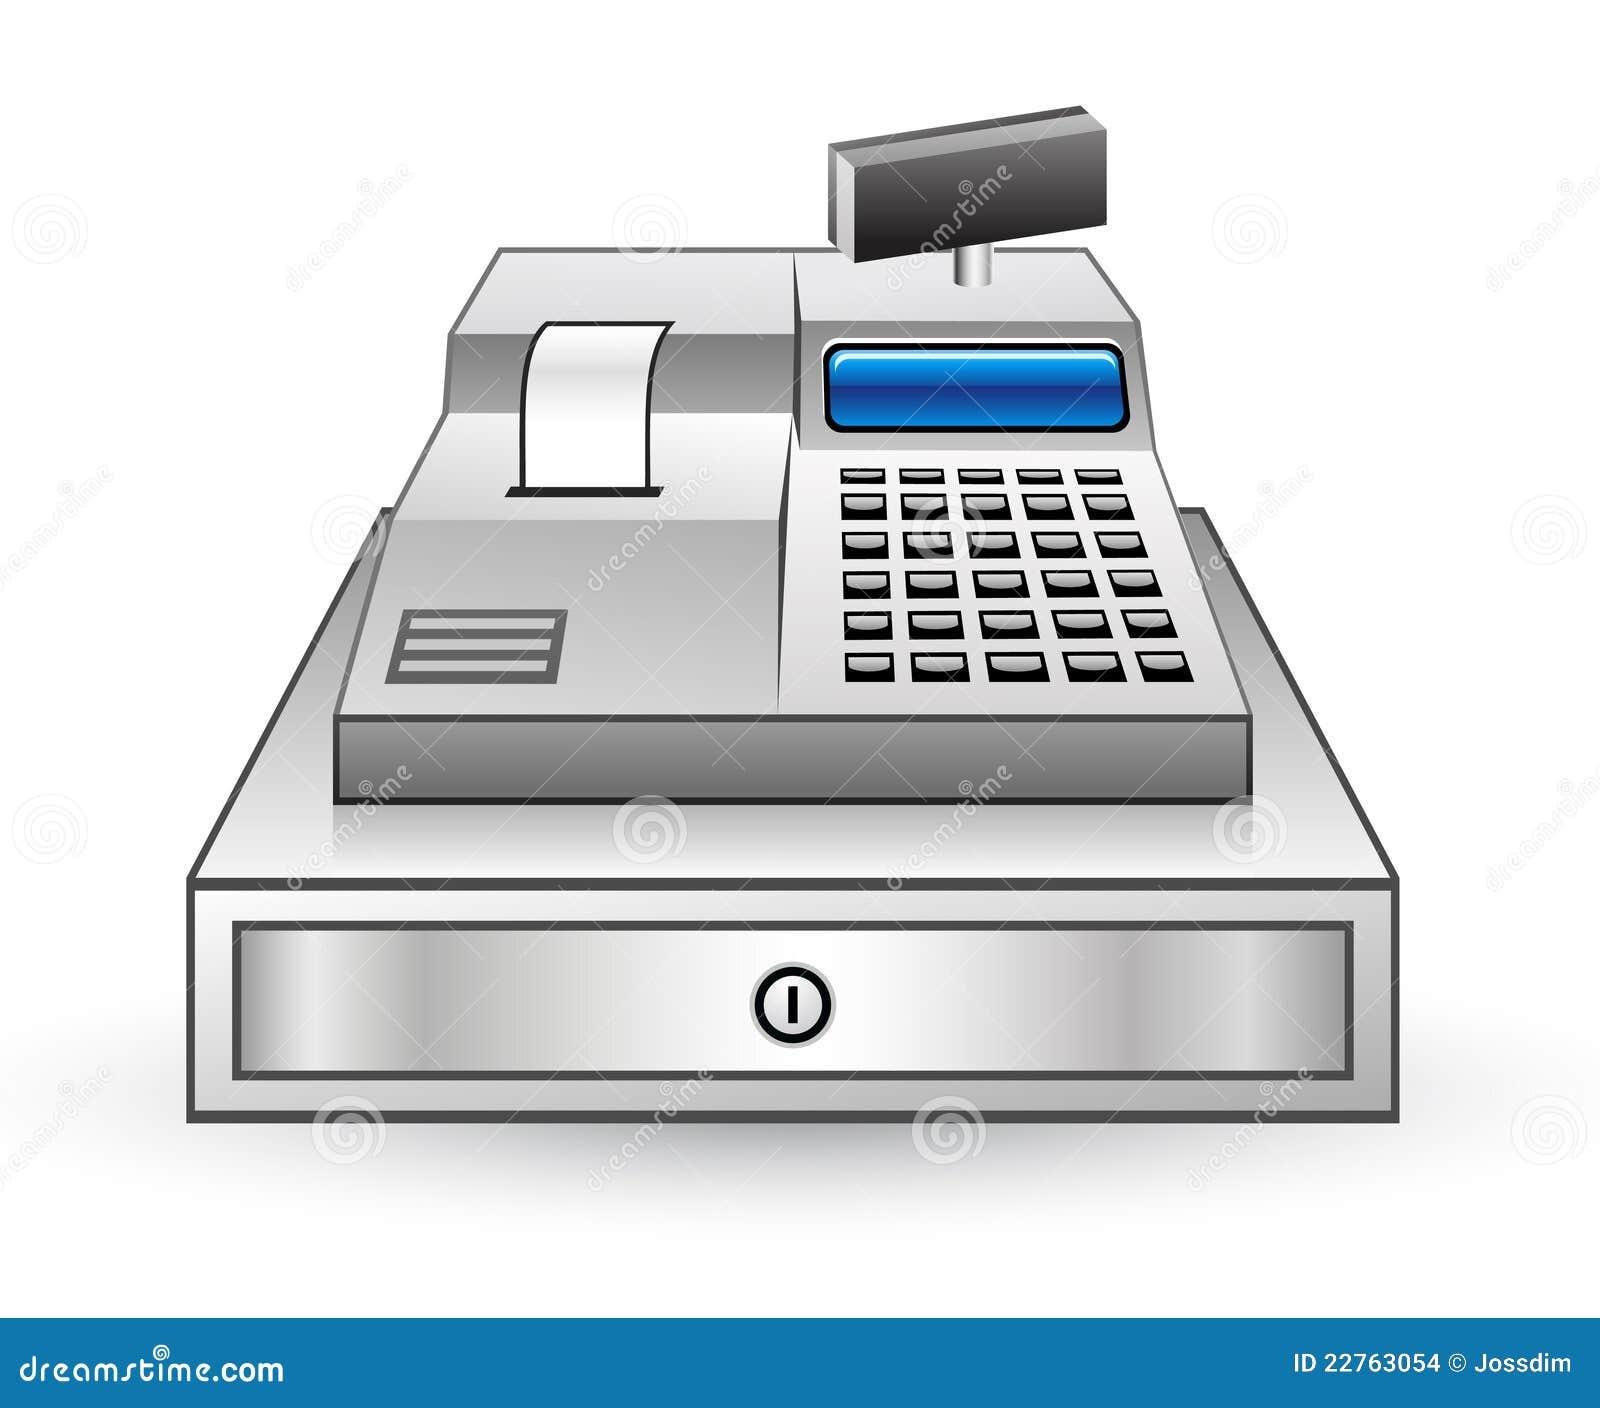 Cash Register Clip Art Cash register